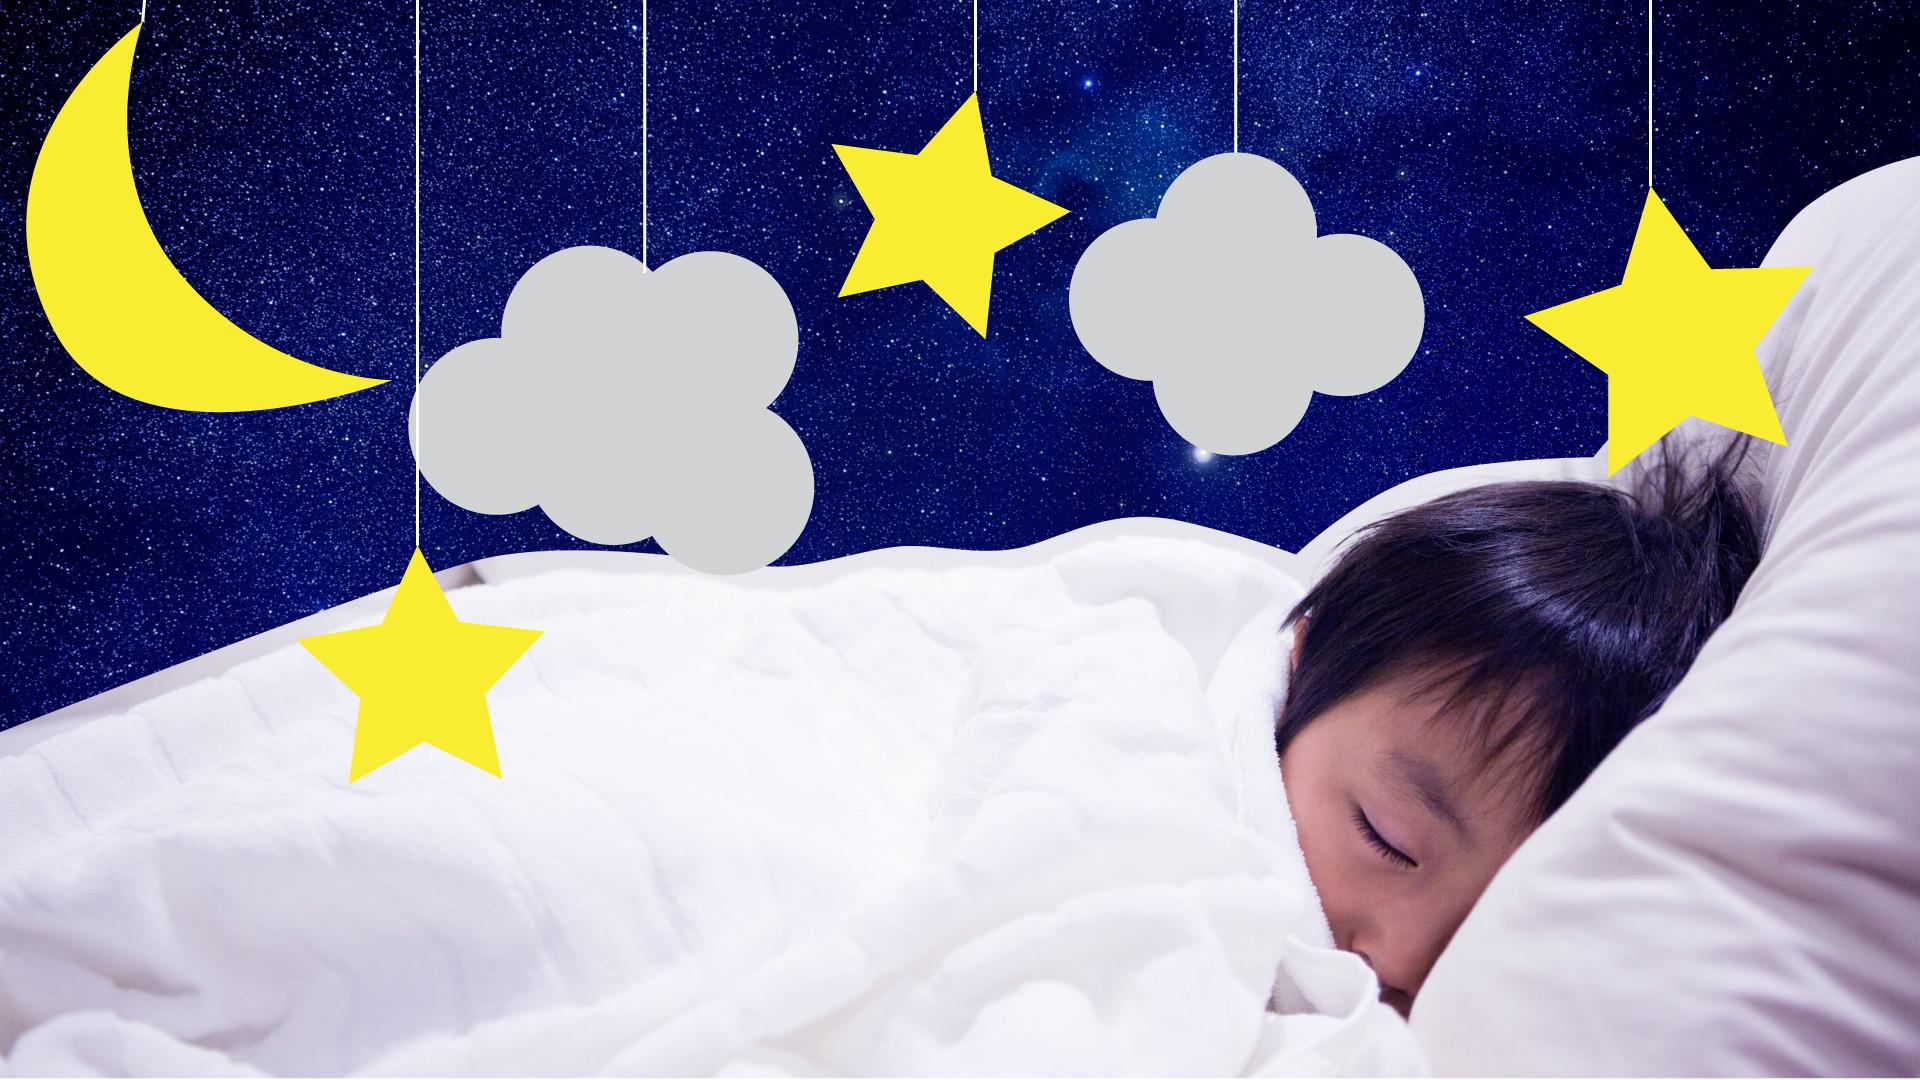 Weighted Blanket for Kid Sleep